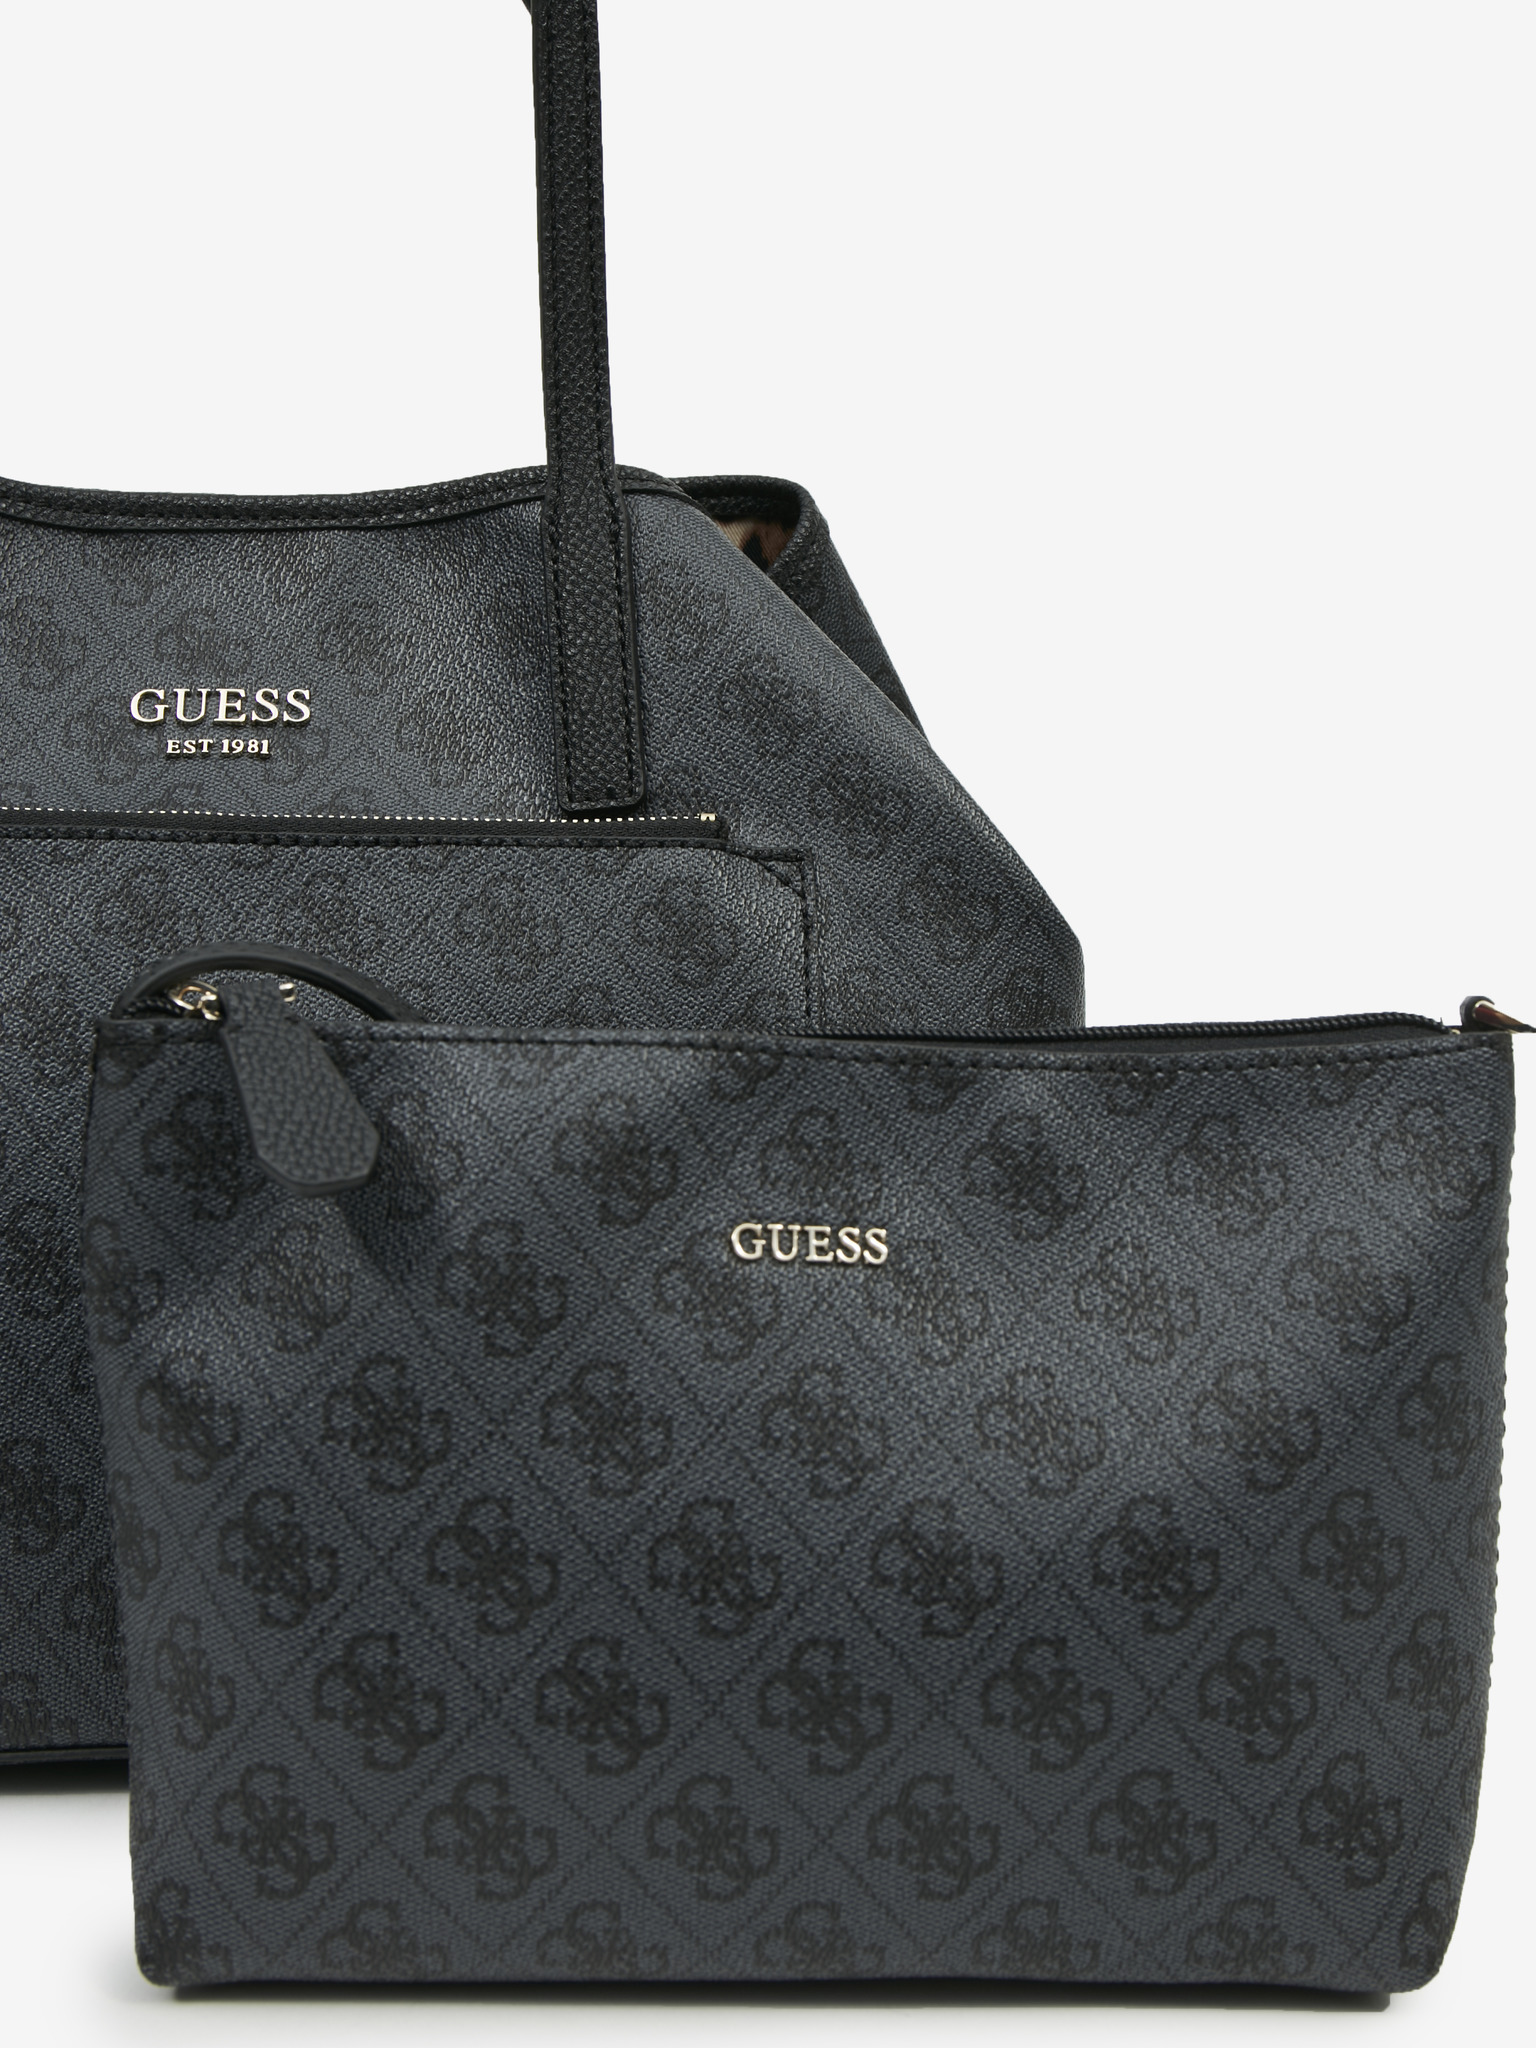 Guess black handbag Vikky Roo